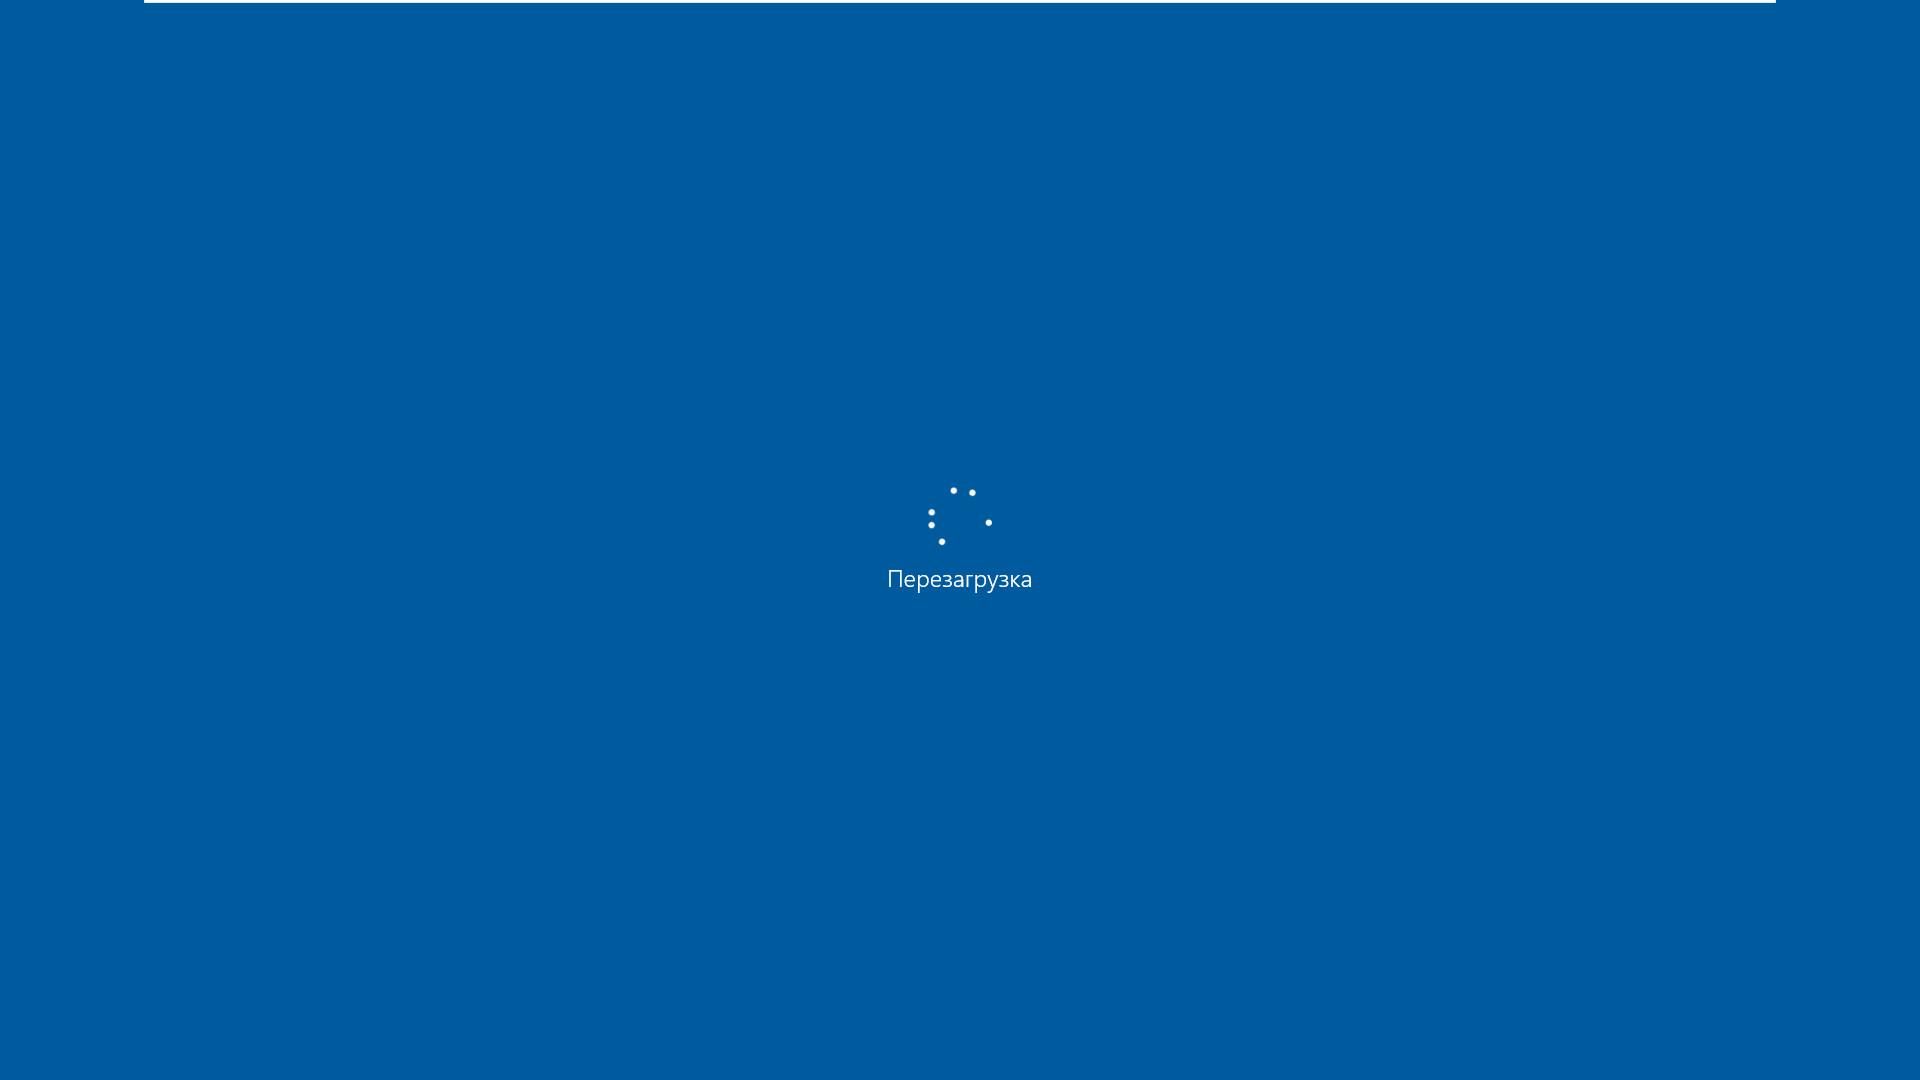 Windows 10 Enterprise x64 lite 1903 build 18362.267 by Zosma.iso - 러시아어 한글화 시도 - 그래서 그냥 원본대로 설치 후에 한글화 시도 2019-08-09_000907.jpg